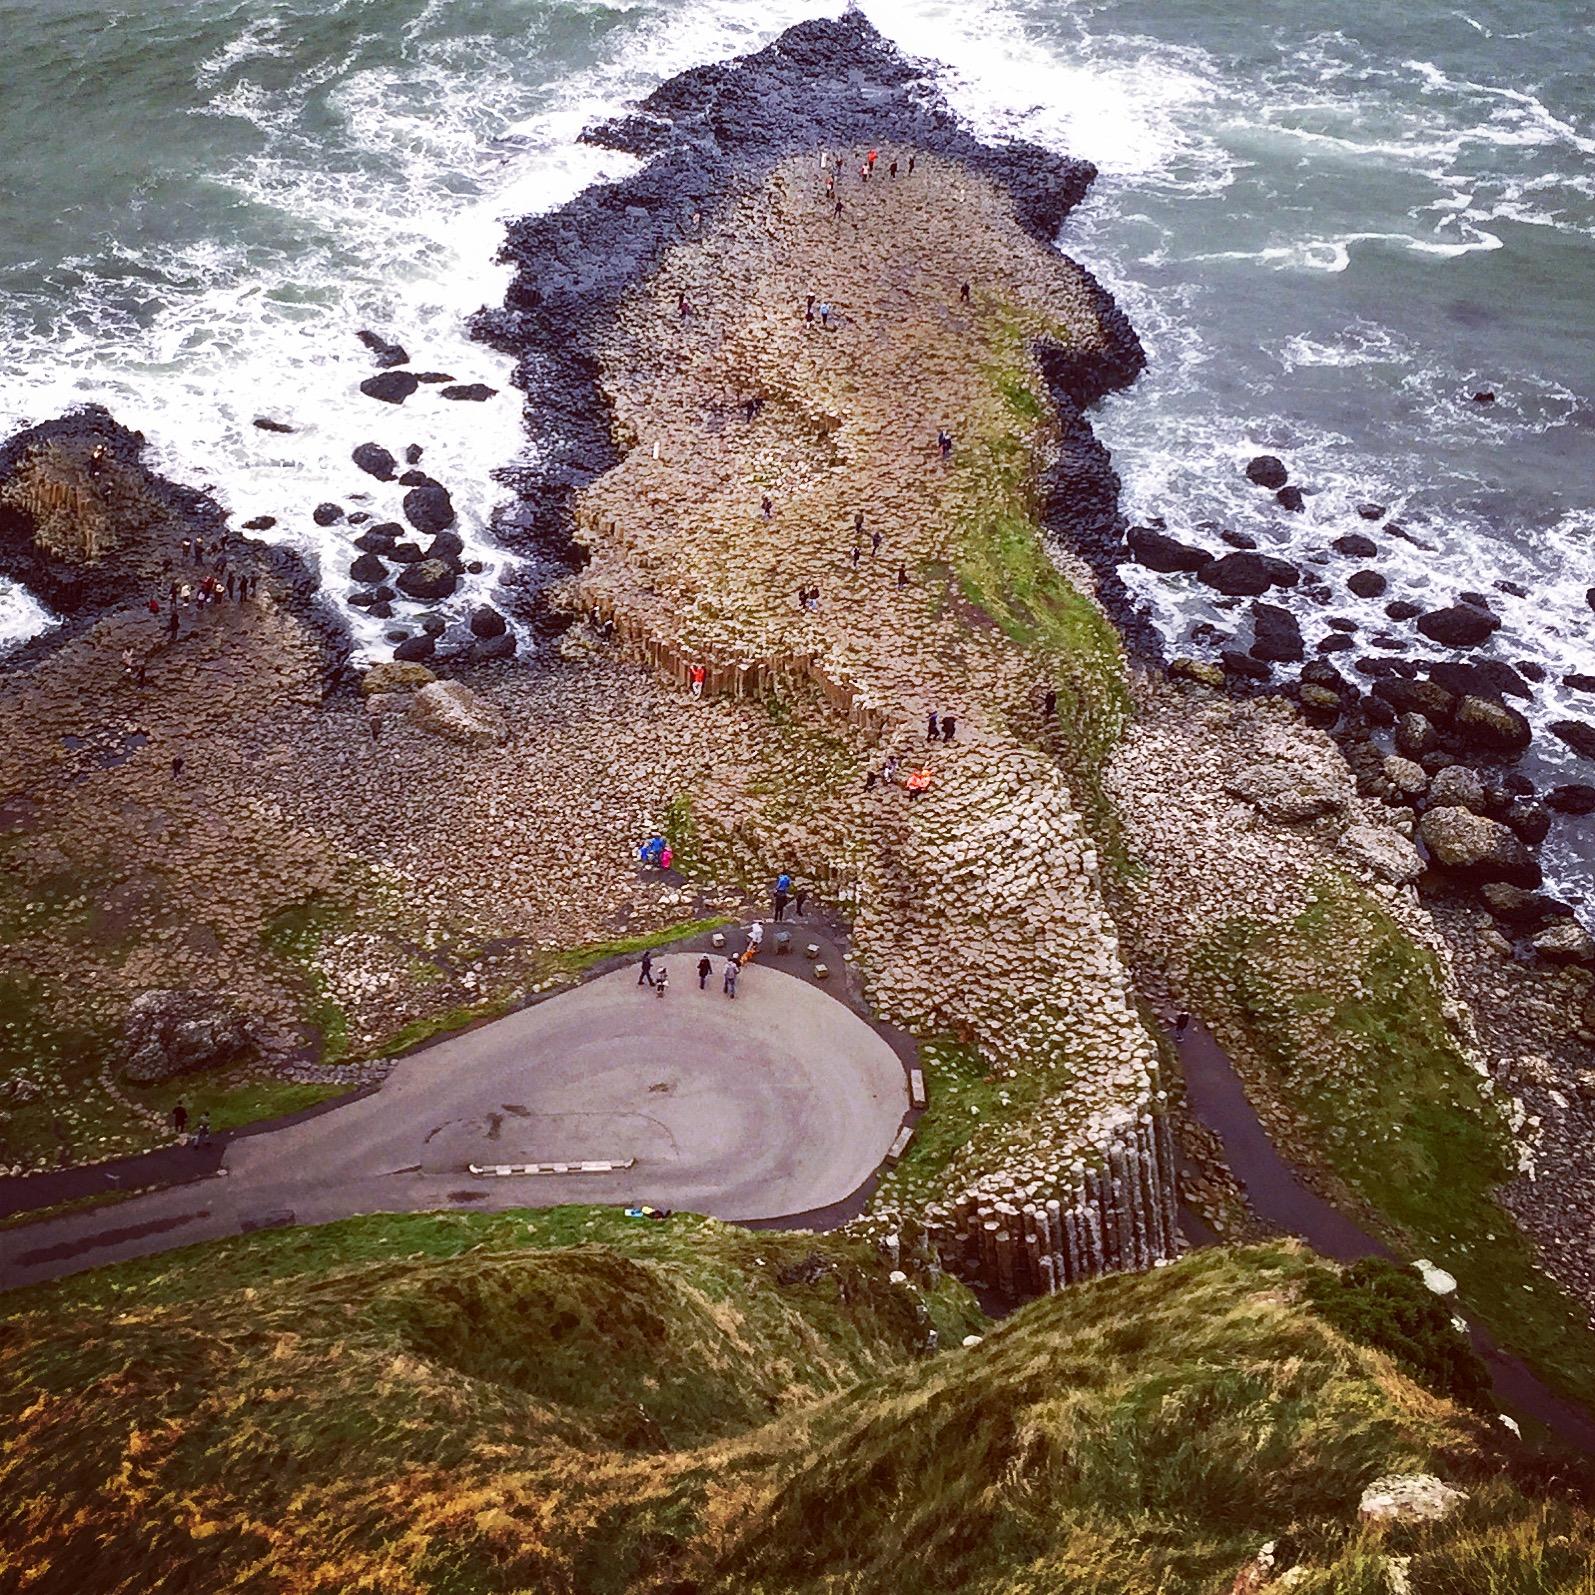 giants_causeway_coast_niexplorer_niexplorer_northern_ireland_travel_culture_blog